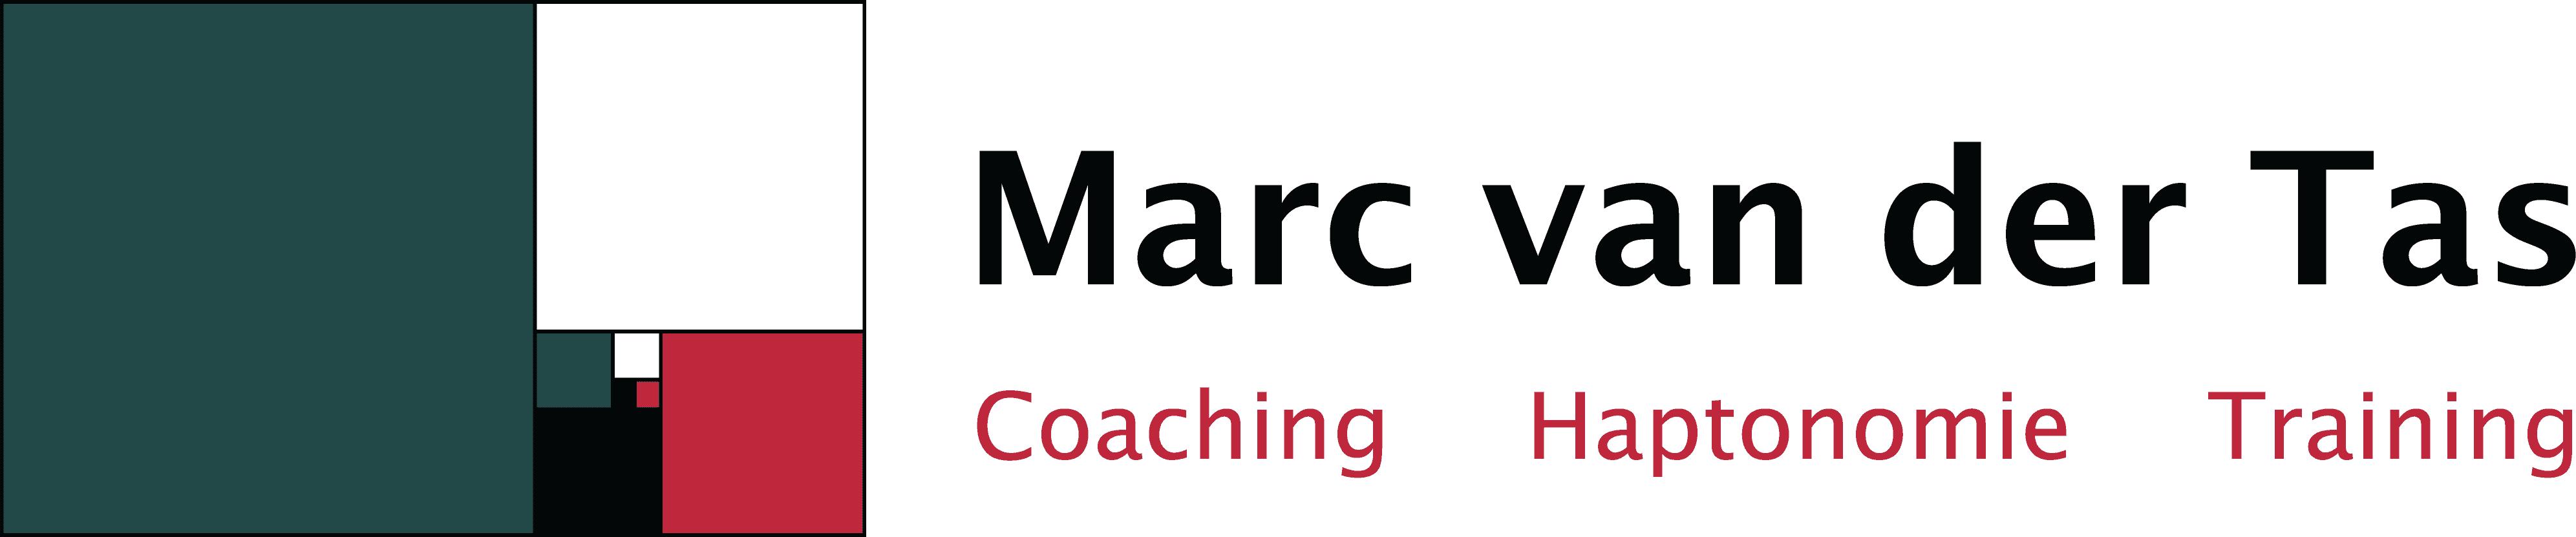 Marc van der Tas